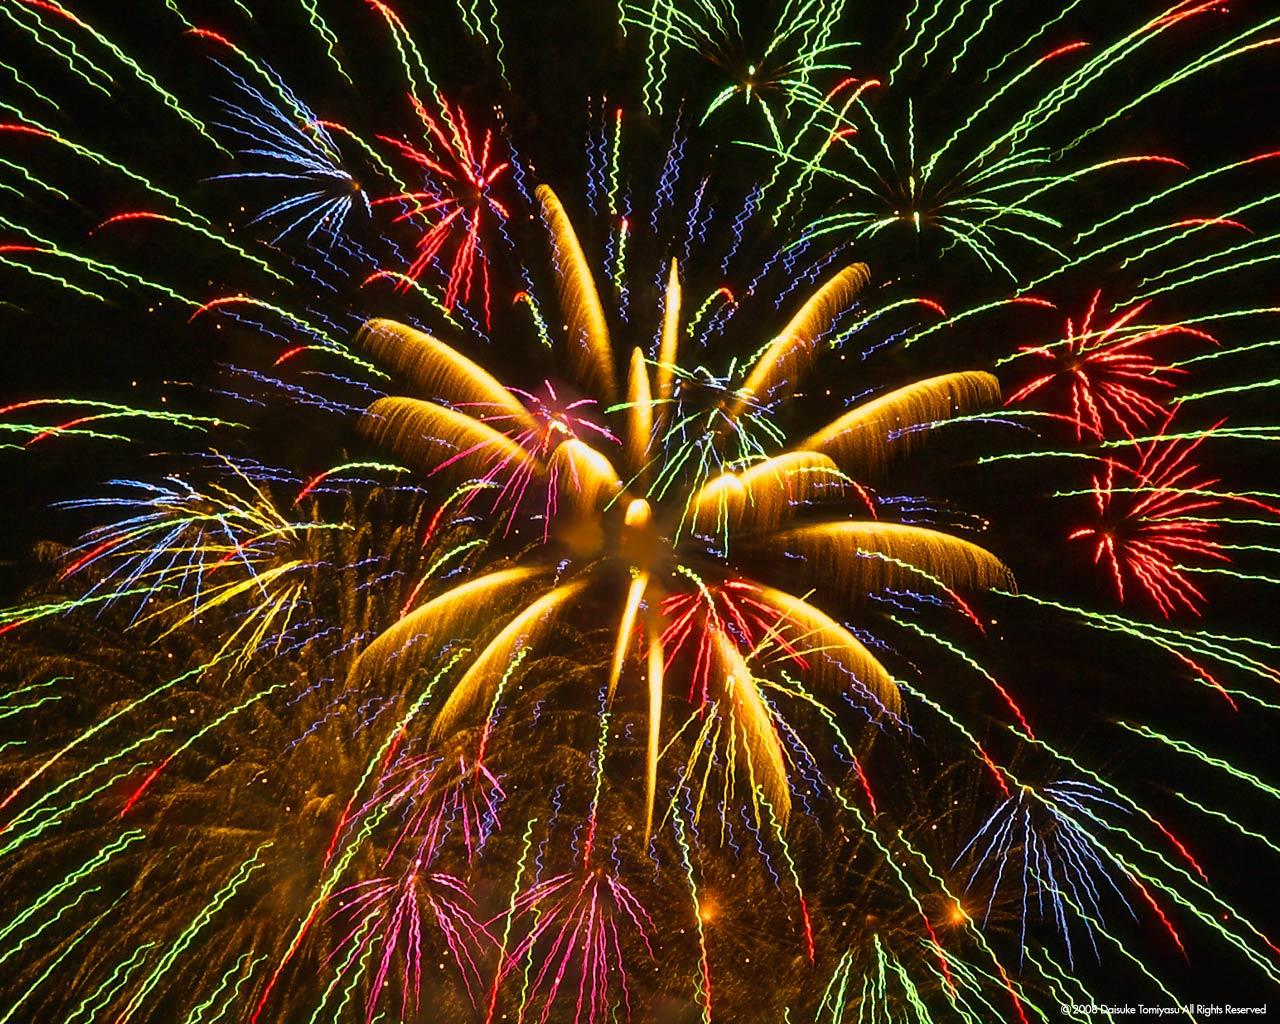 Moving Fireworks Clipart-Moving fireworks clipart-16